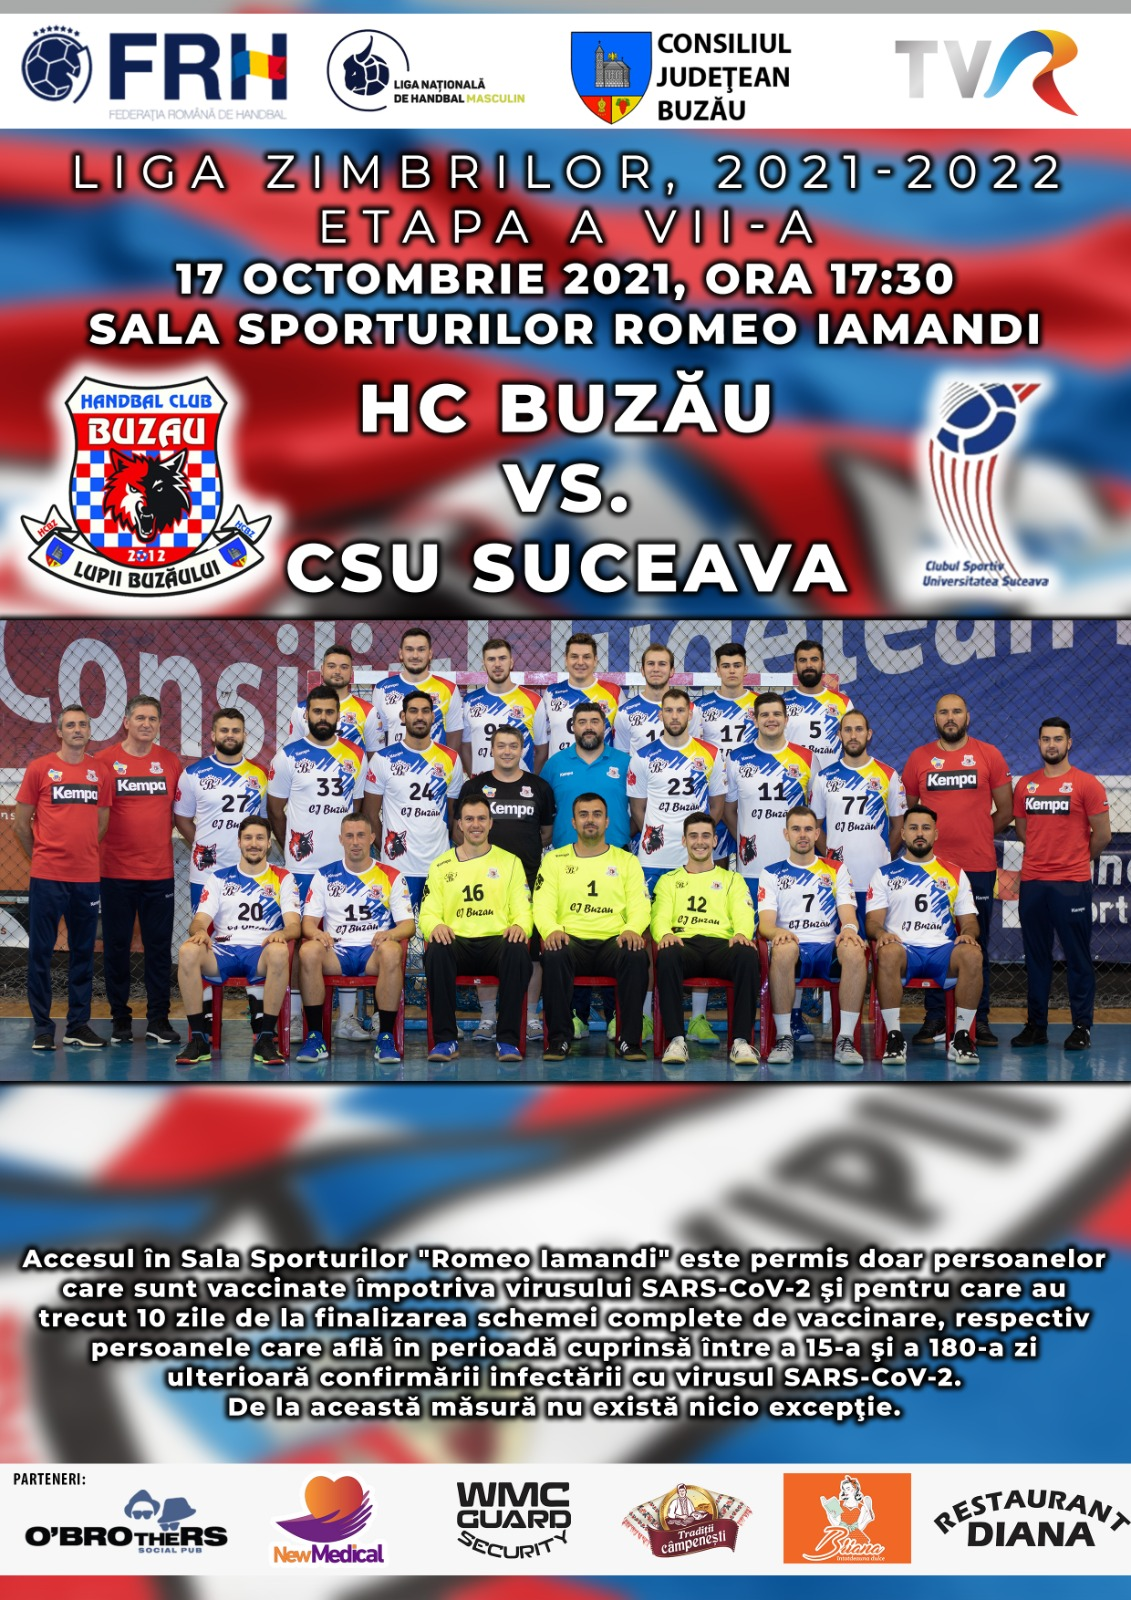 HC Buzău - CSU Suceava